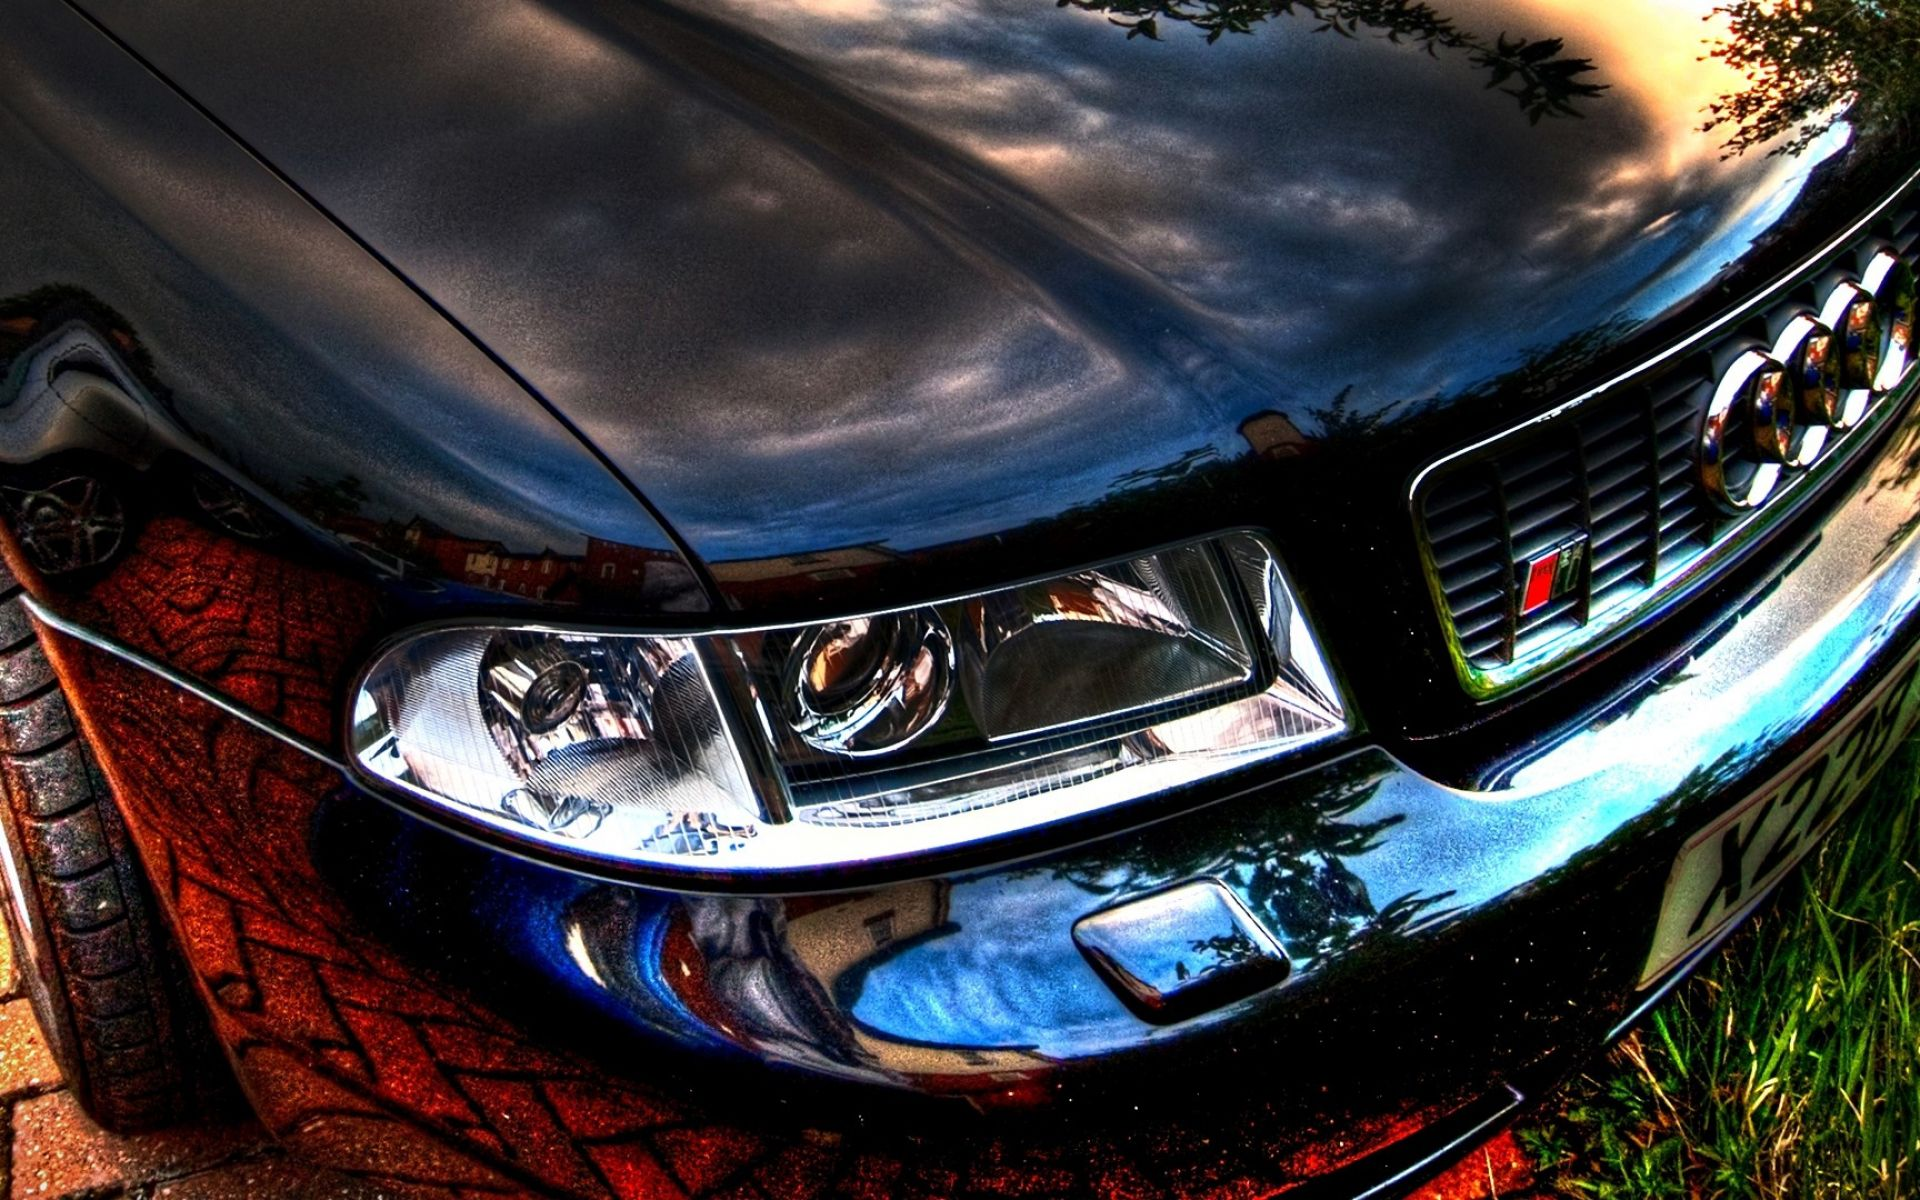 cars audi hdr photography audi   HD Wallpaper